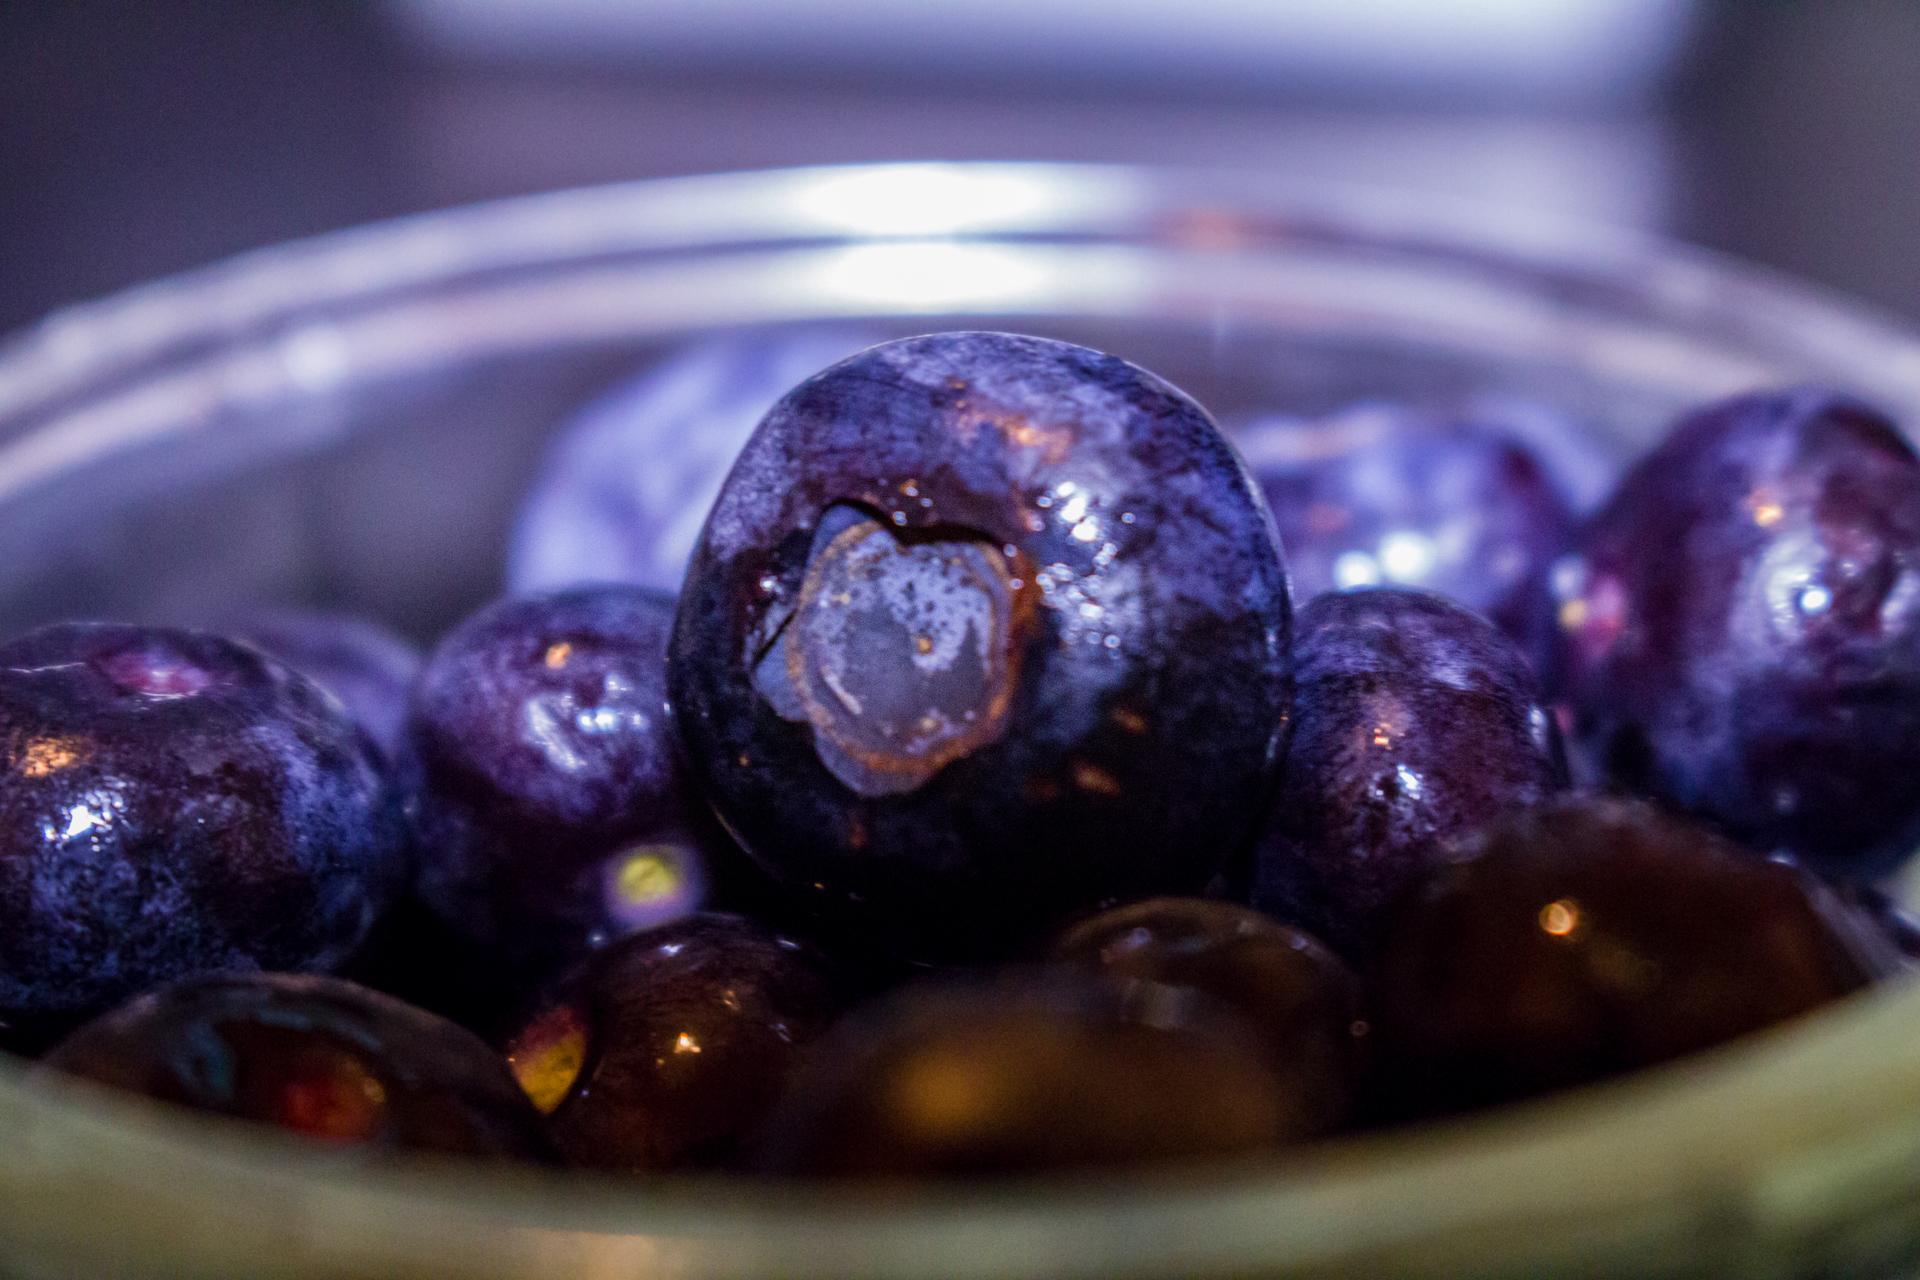 Blueberry | rick.cognyl.fournier, fruit, no person, food